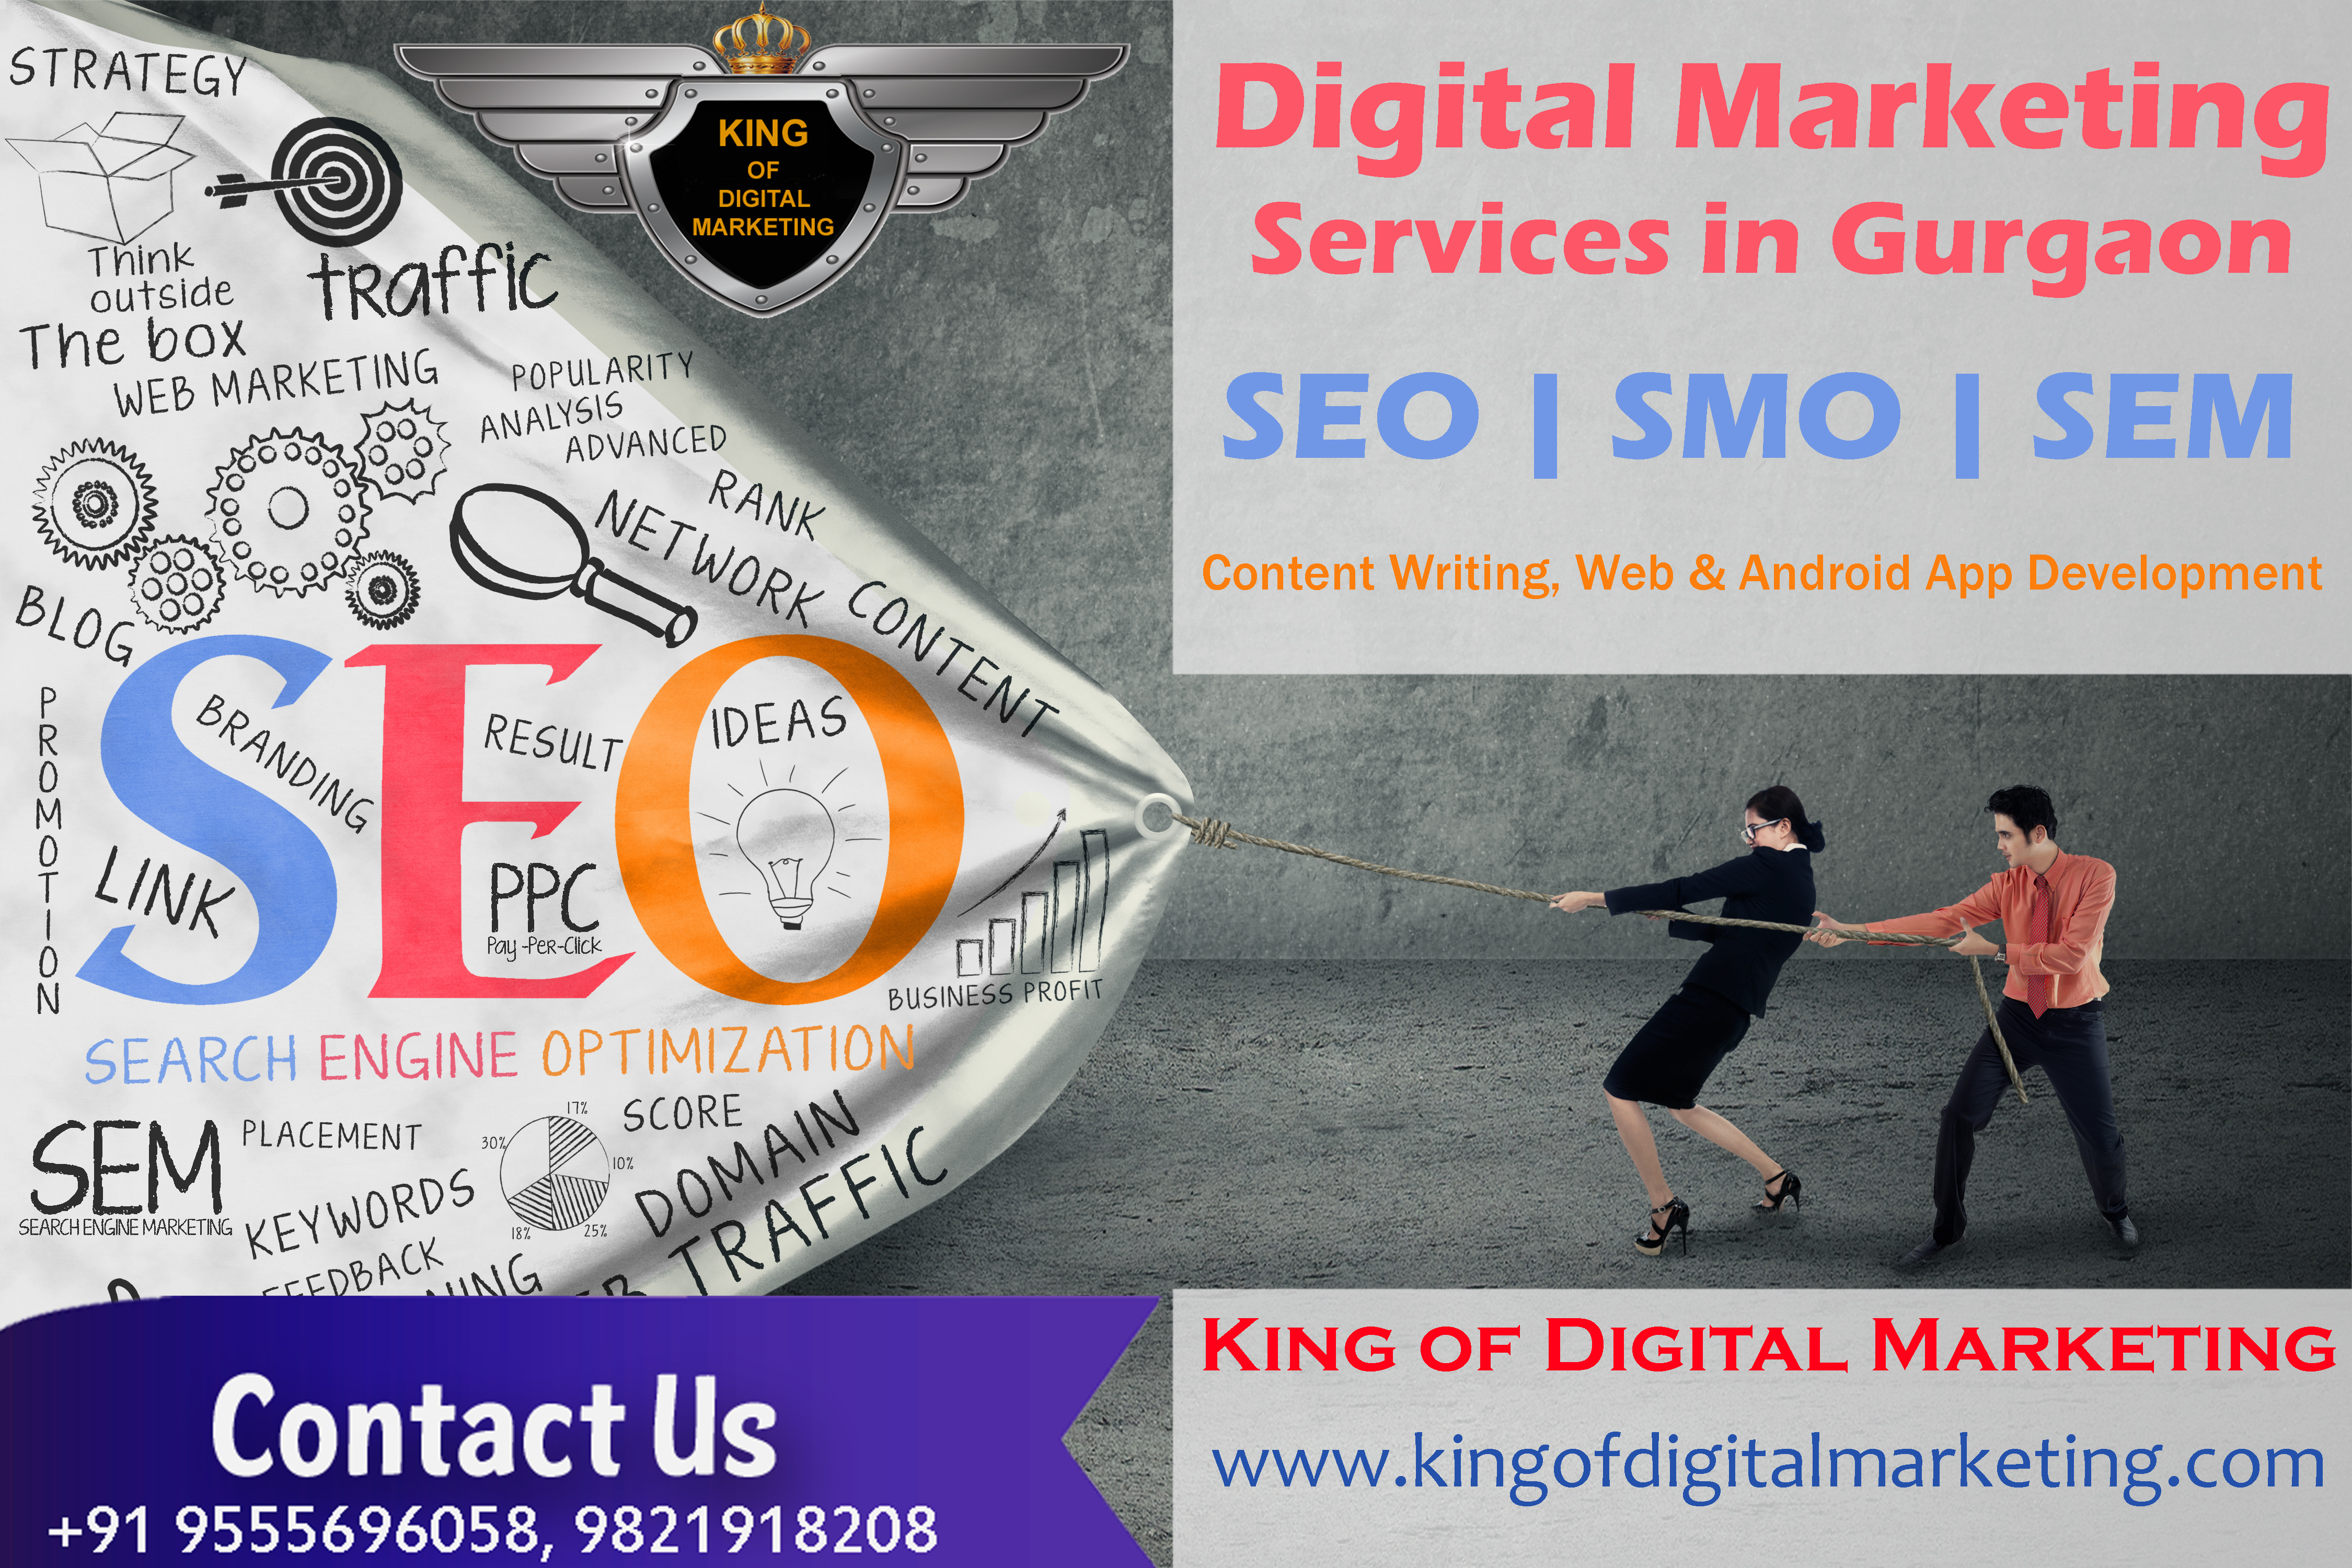 KDM: SEO Services Company in Gurgaon, SEO Services Gurgaon